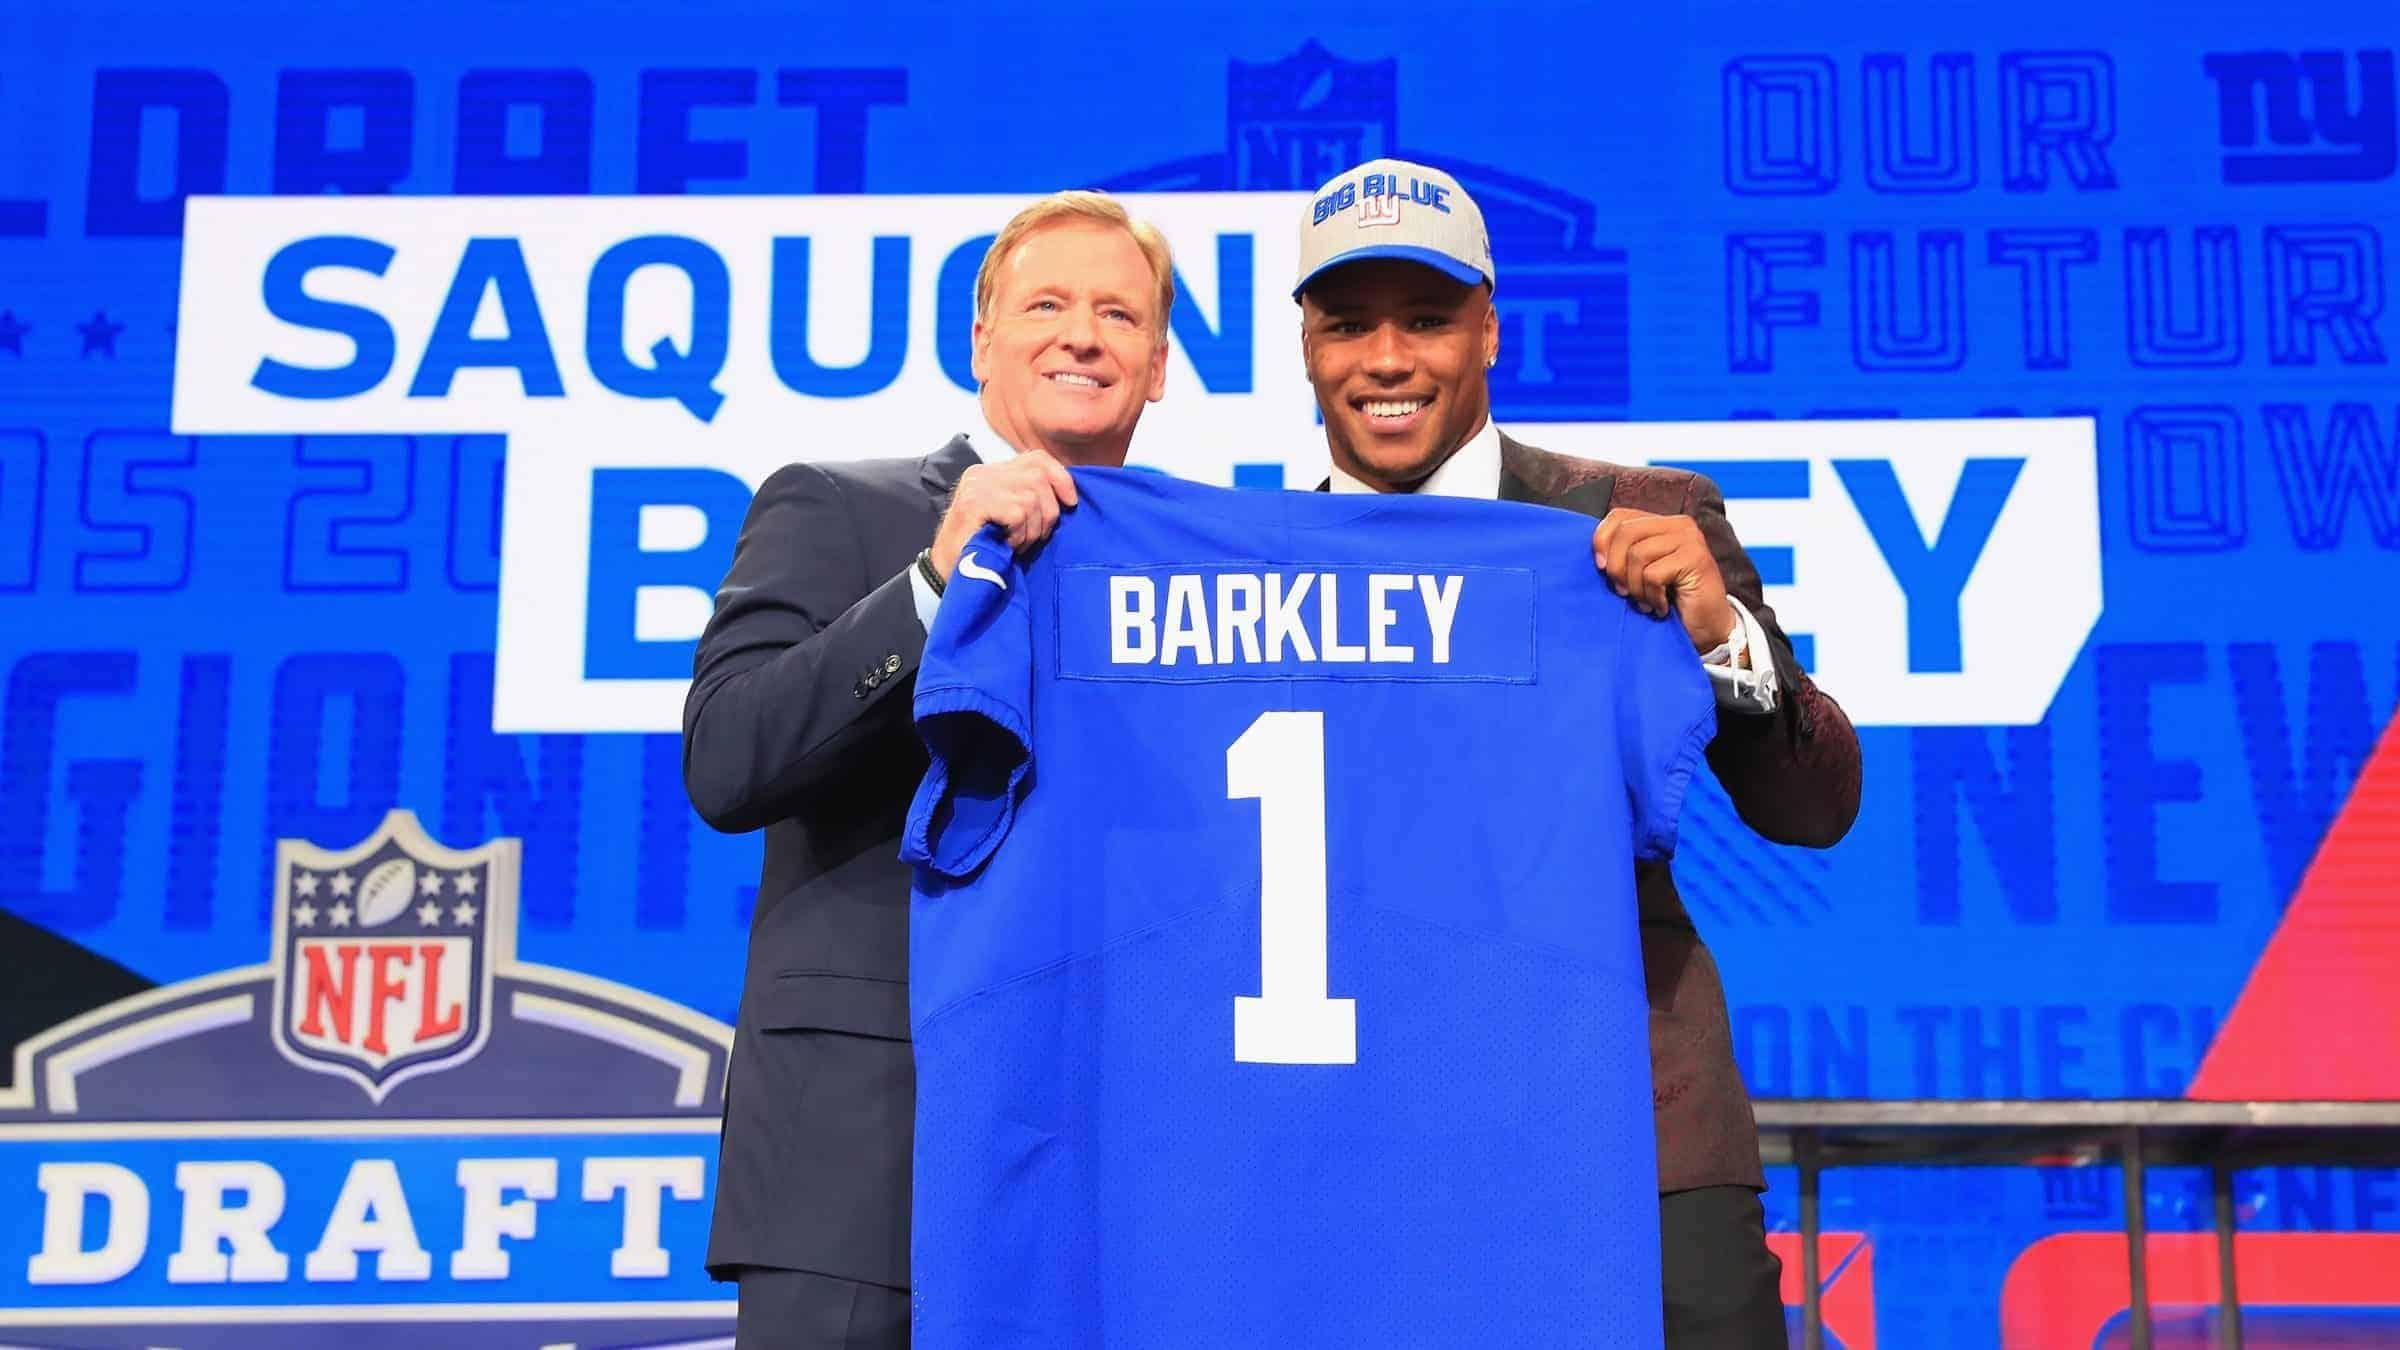 New York Giants Saquon Barkley